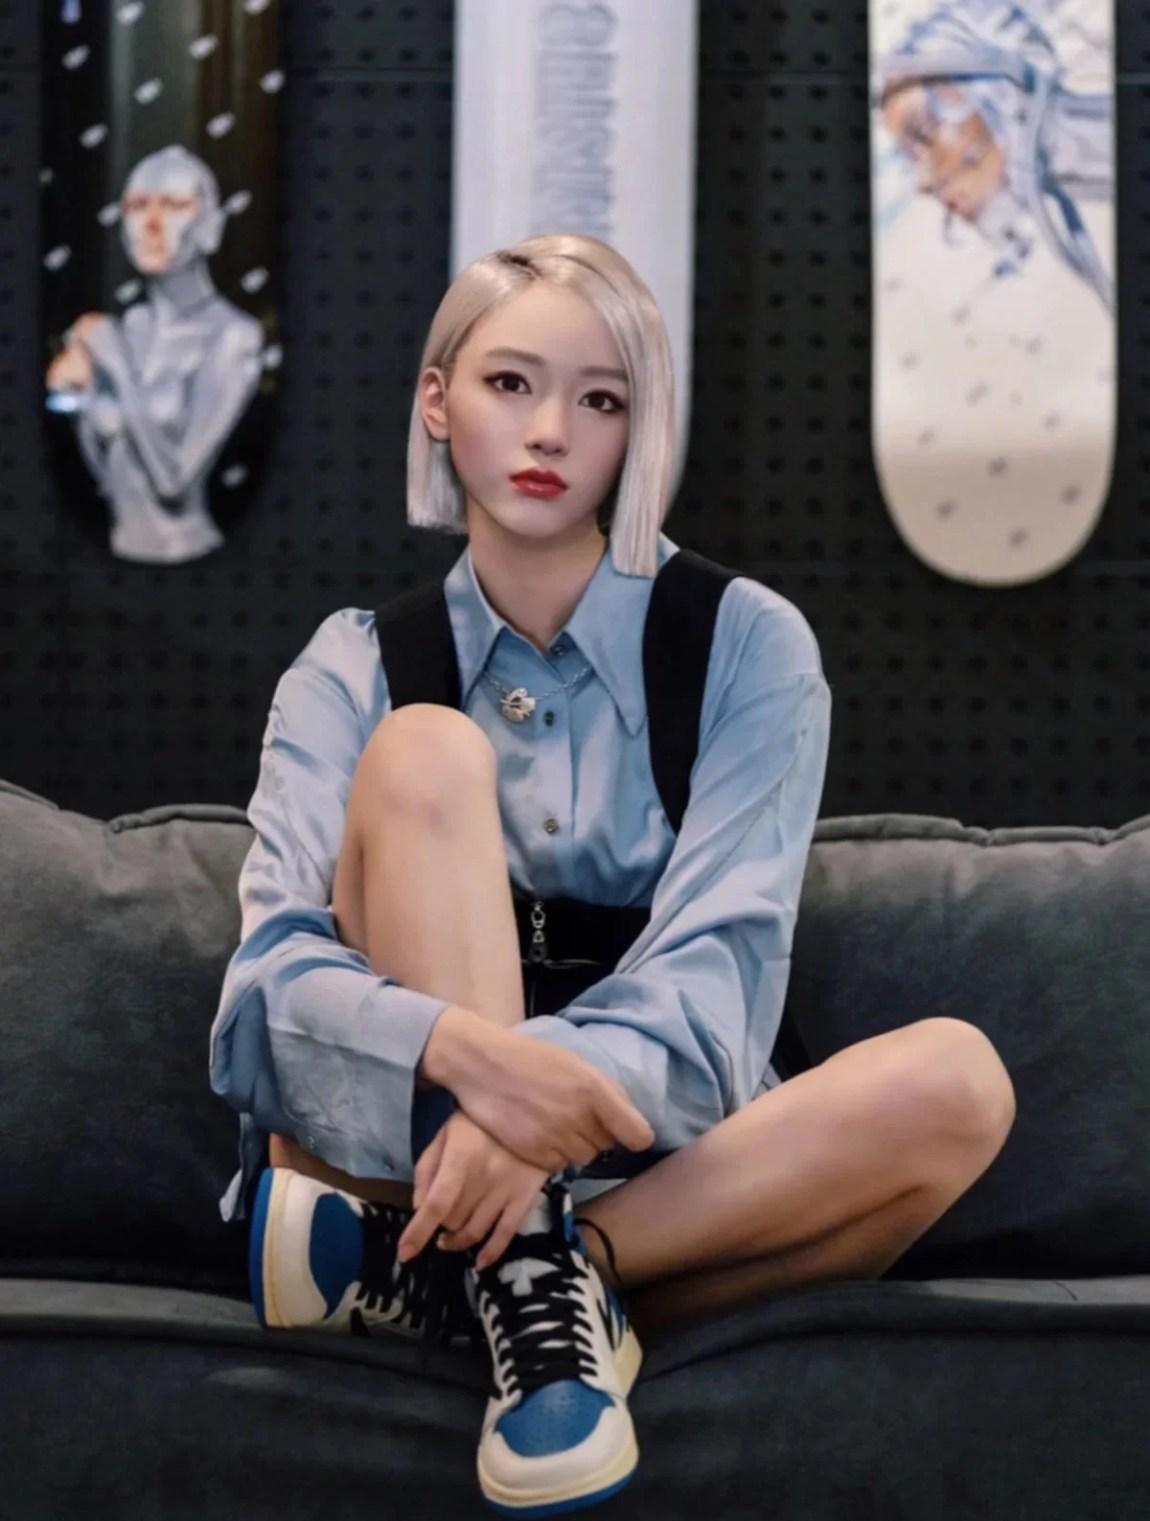 Meet Ayayi, a realistic virtual influencer